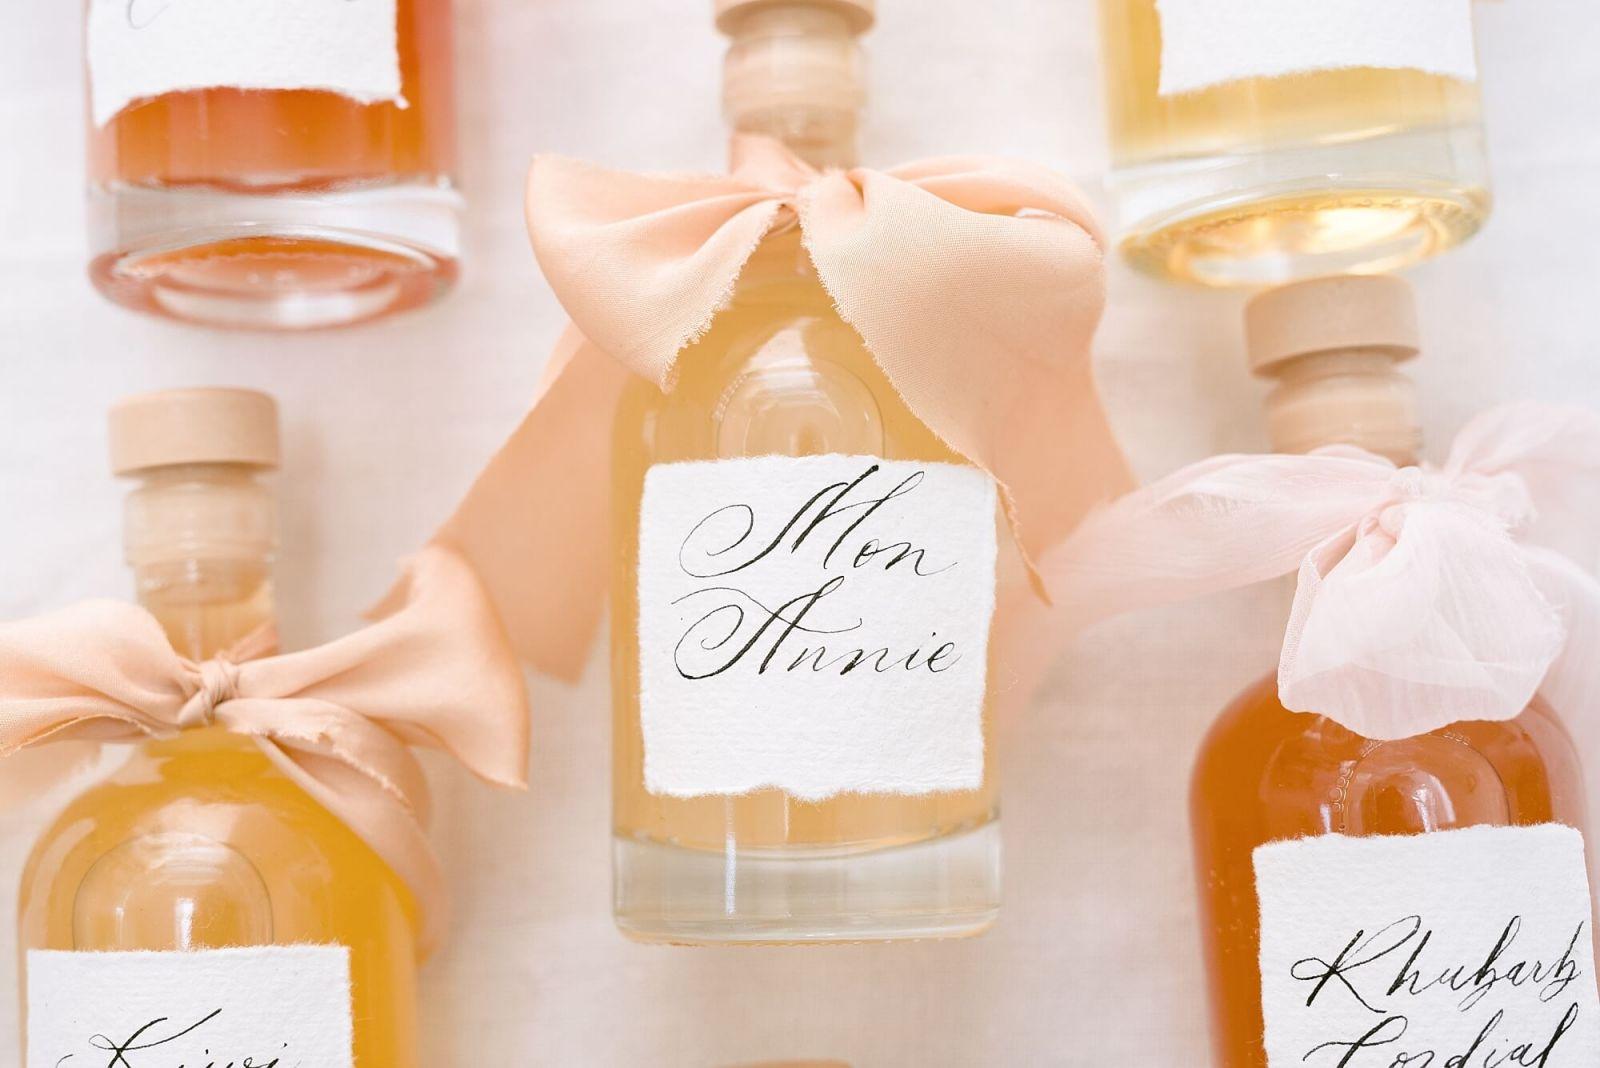 Luxury wedding cakes and patisserie | MonAnnie